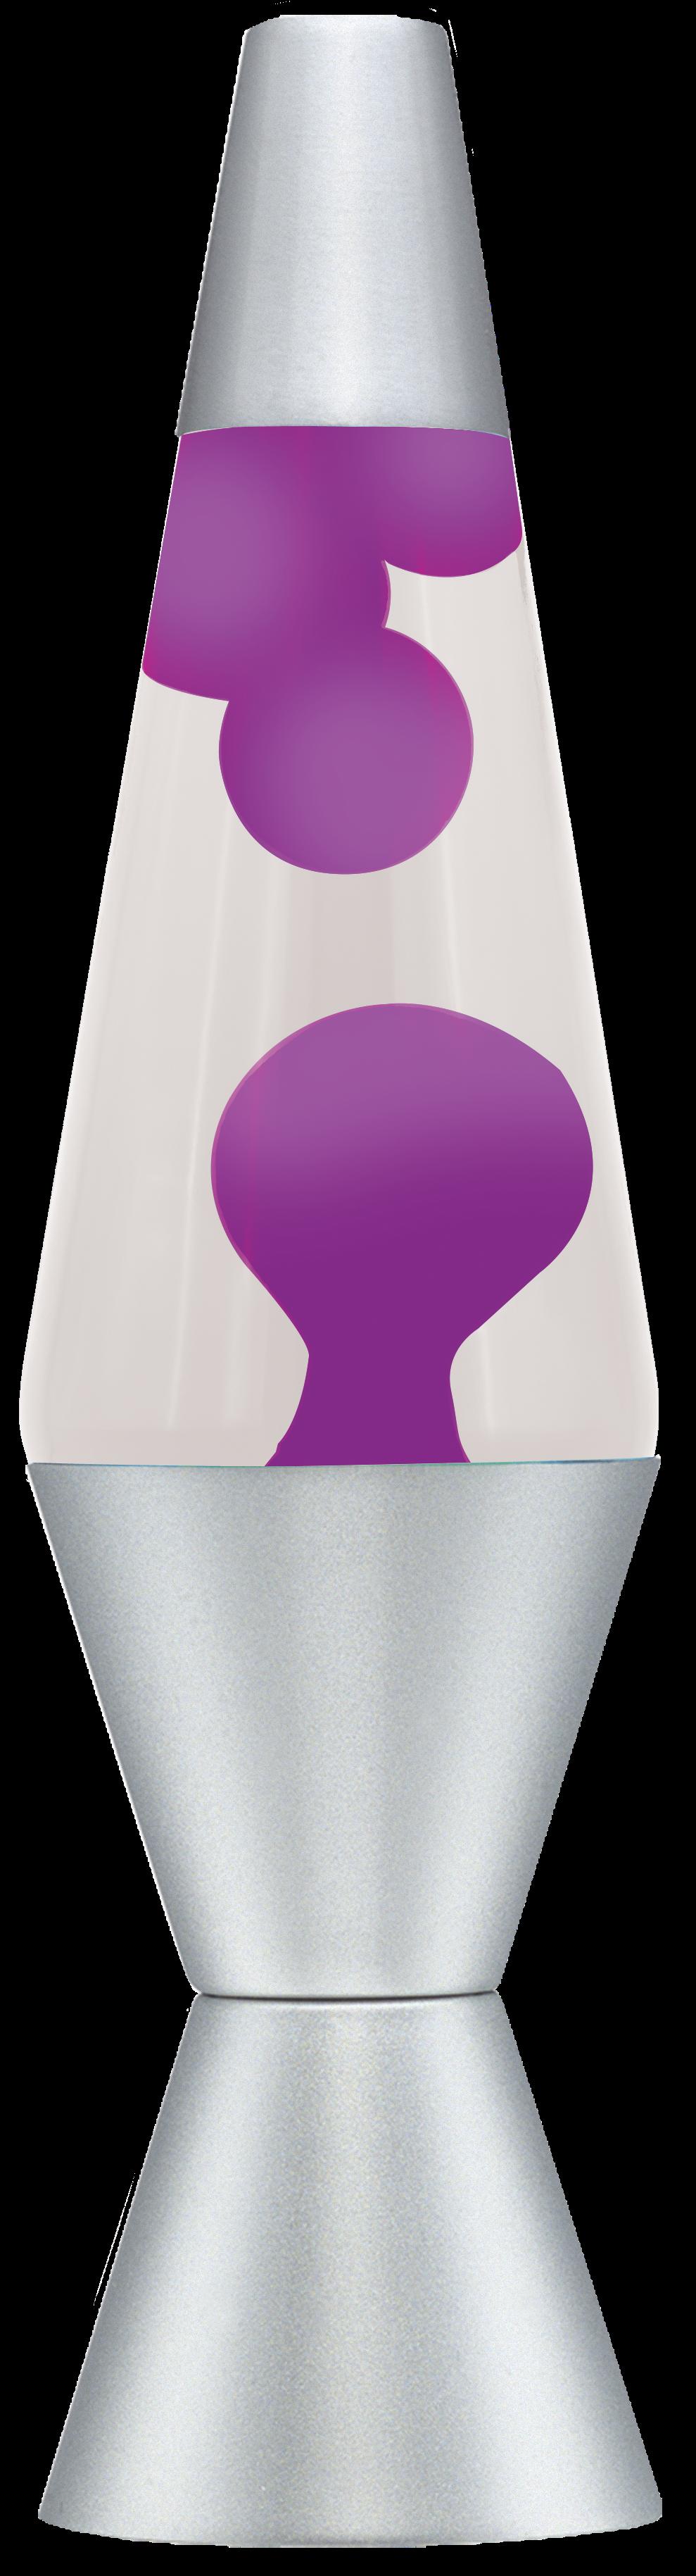 14 5 Classic Purple Lava Lamp Lamp Novelty Lamp